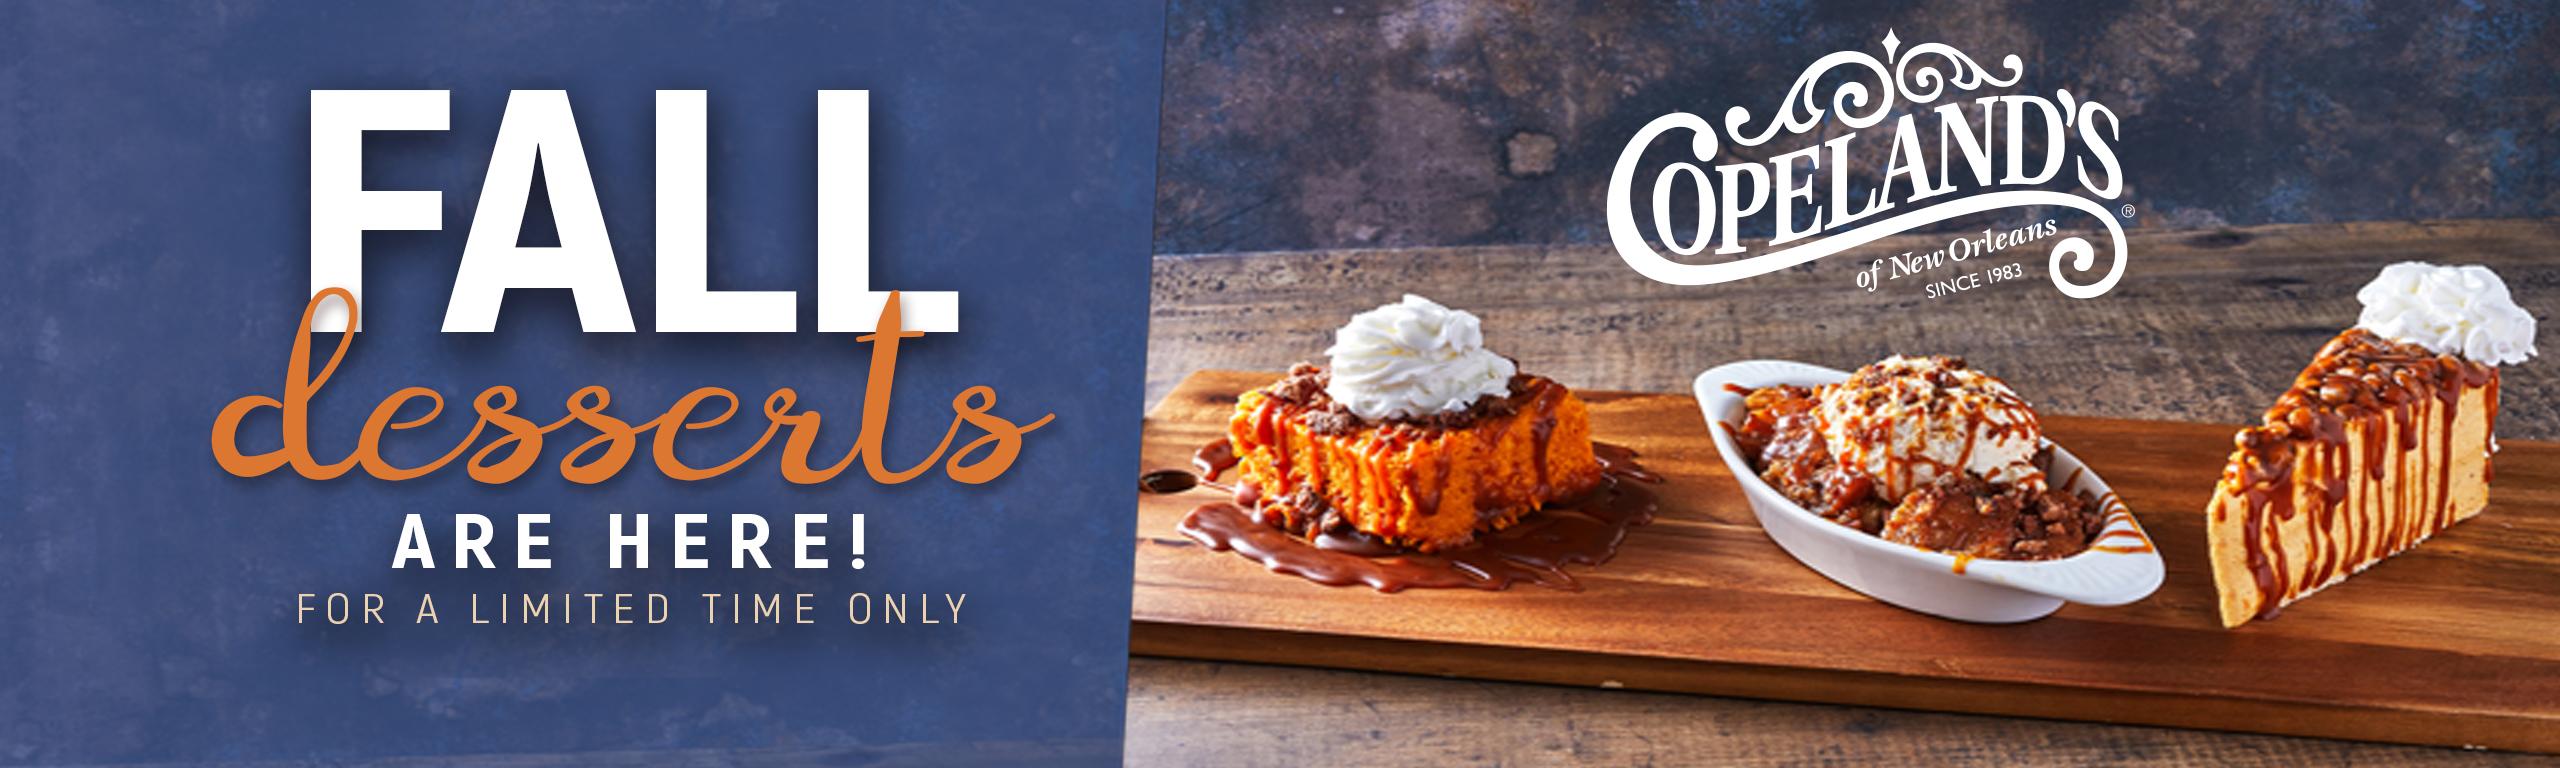 CNOATL_Fall21_ banner - Desserts